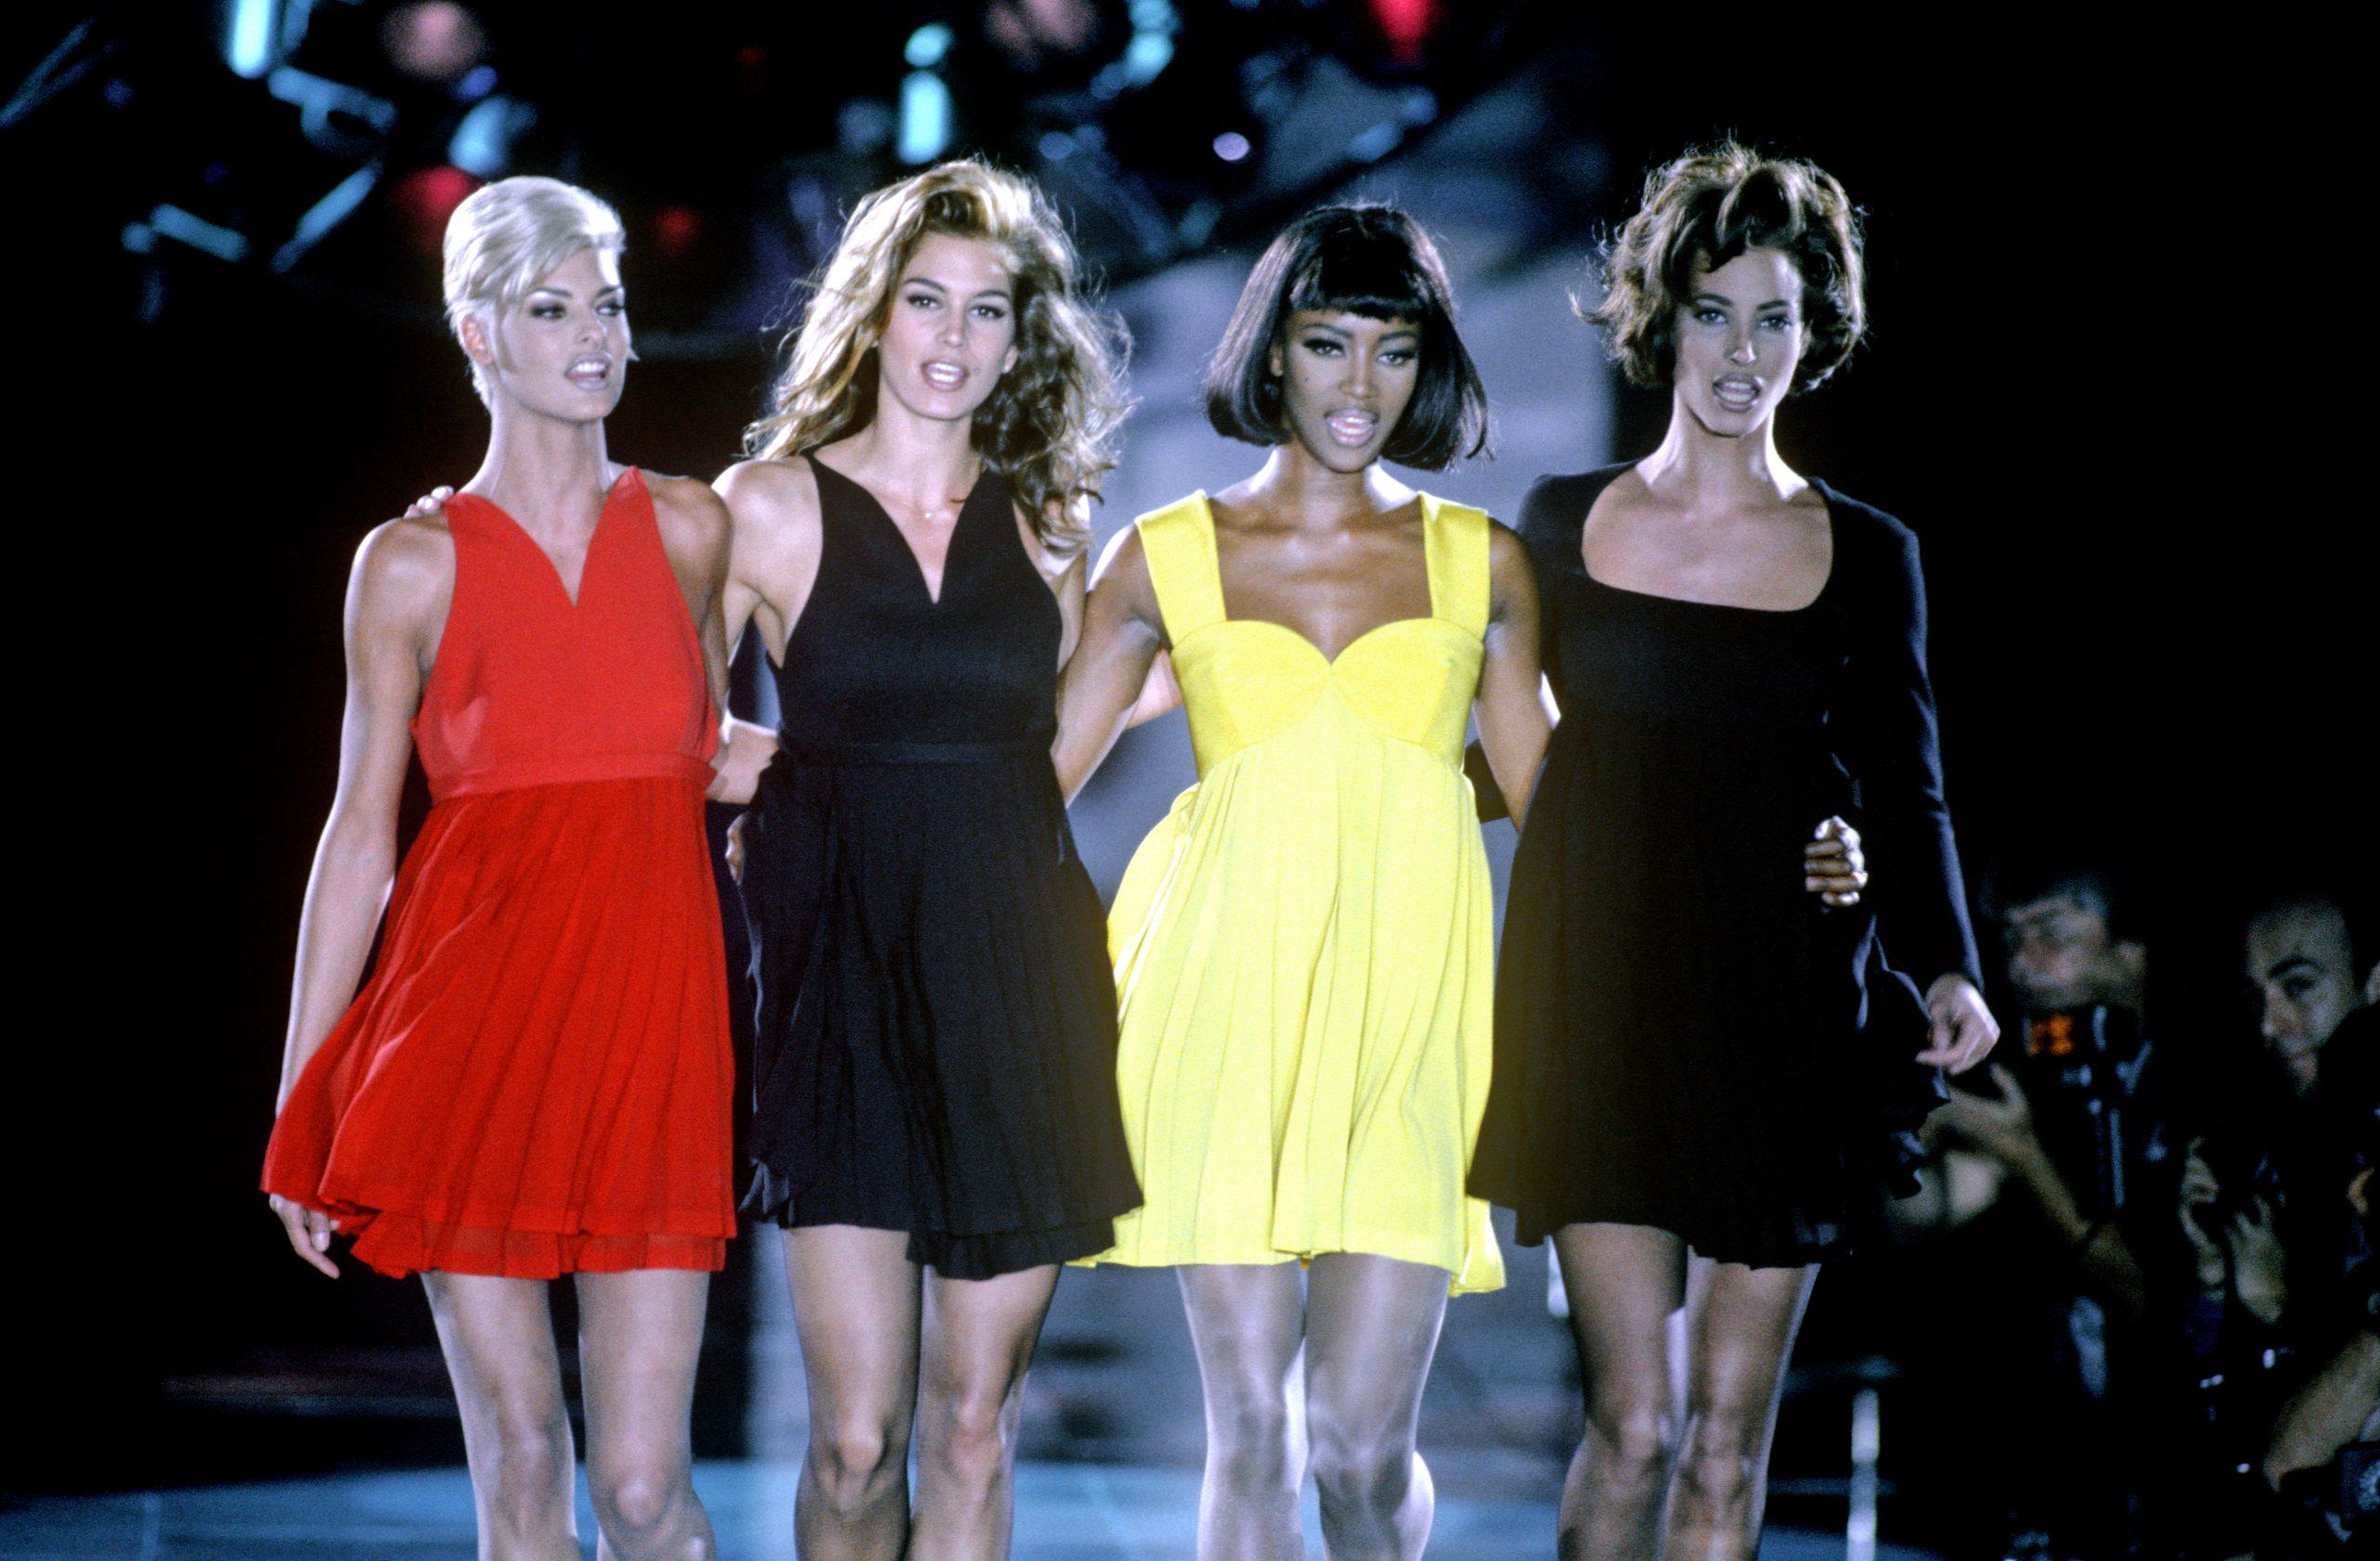 Versace Autumn Winter Fashion Show, Milan, Italy - Dec 1991